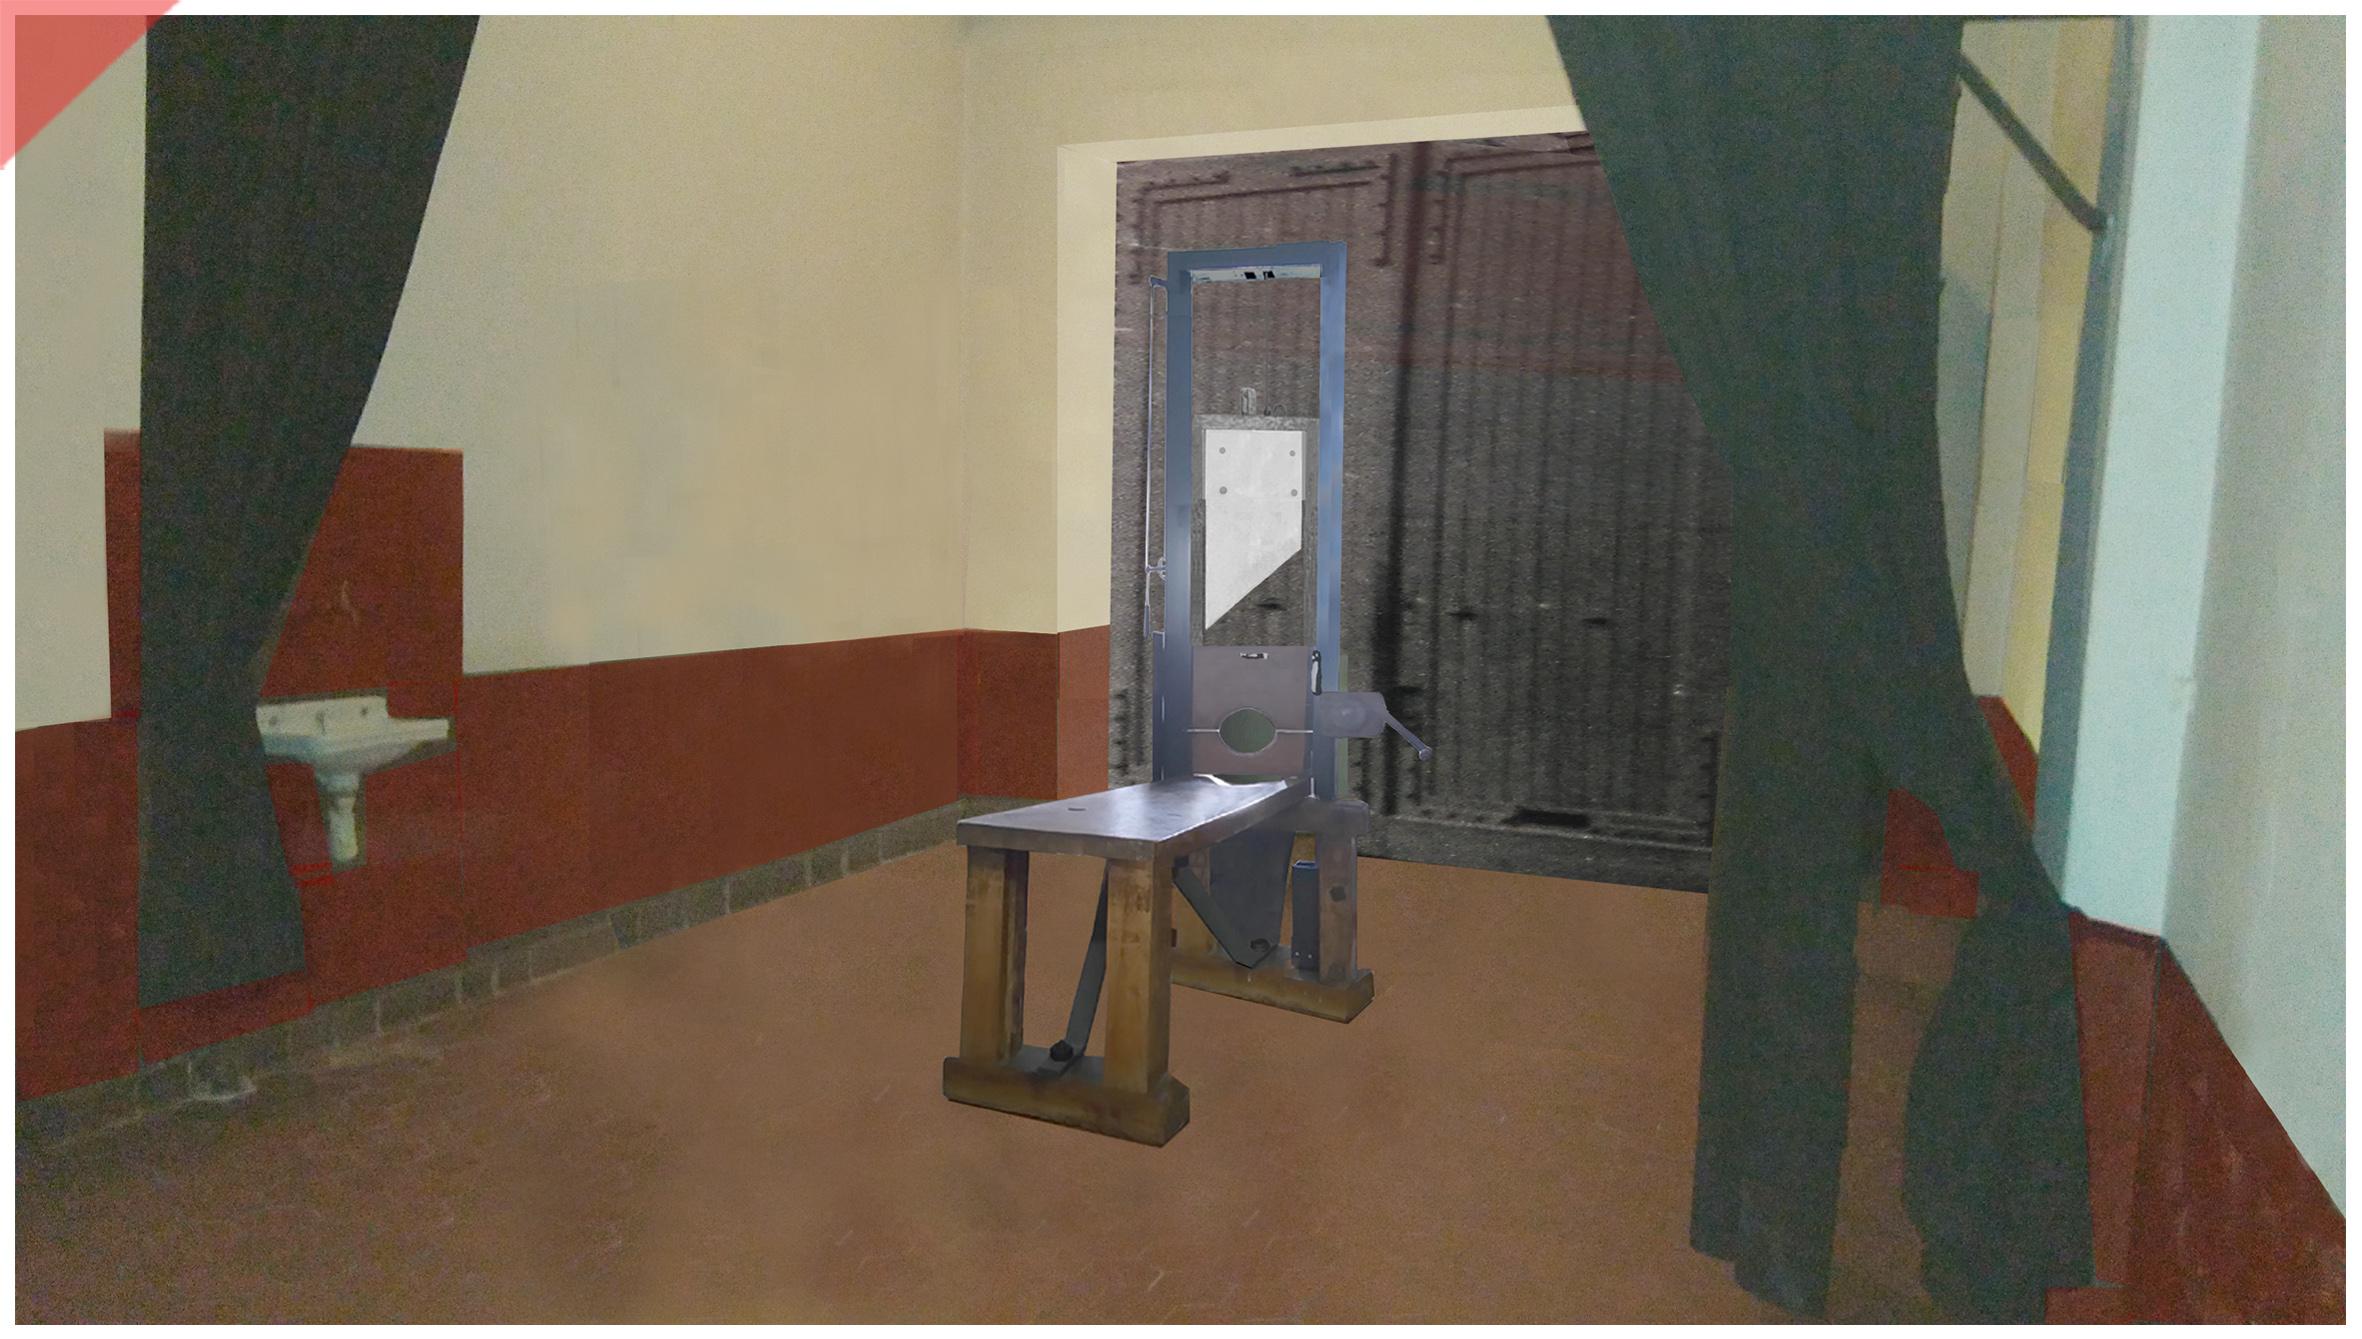 Brandenburg-Görden-Goerden-prison-room-then-1945-original-German-Fallbeil-Modell-T-Mannhardt-Guillotine-Röttger-Roettger-Garage